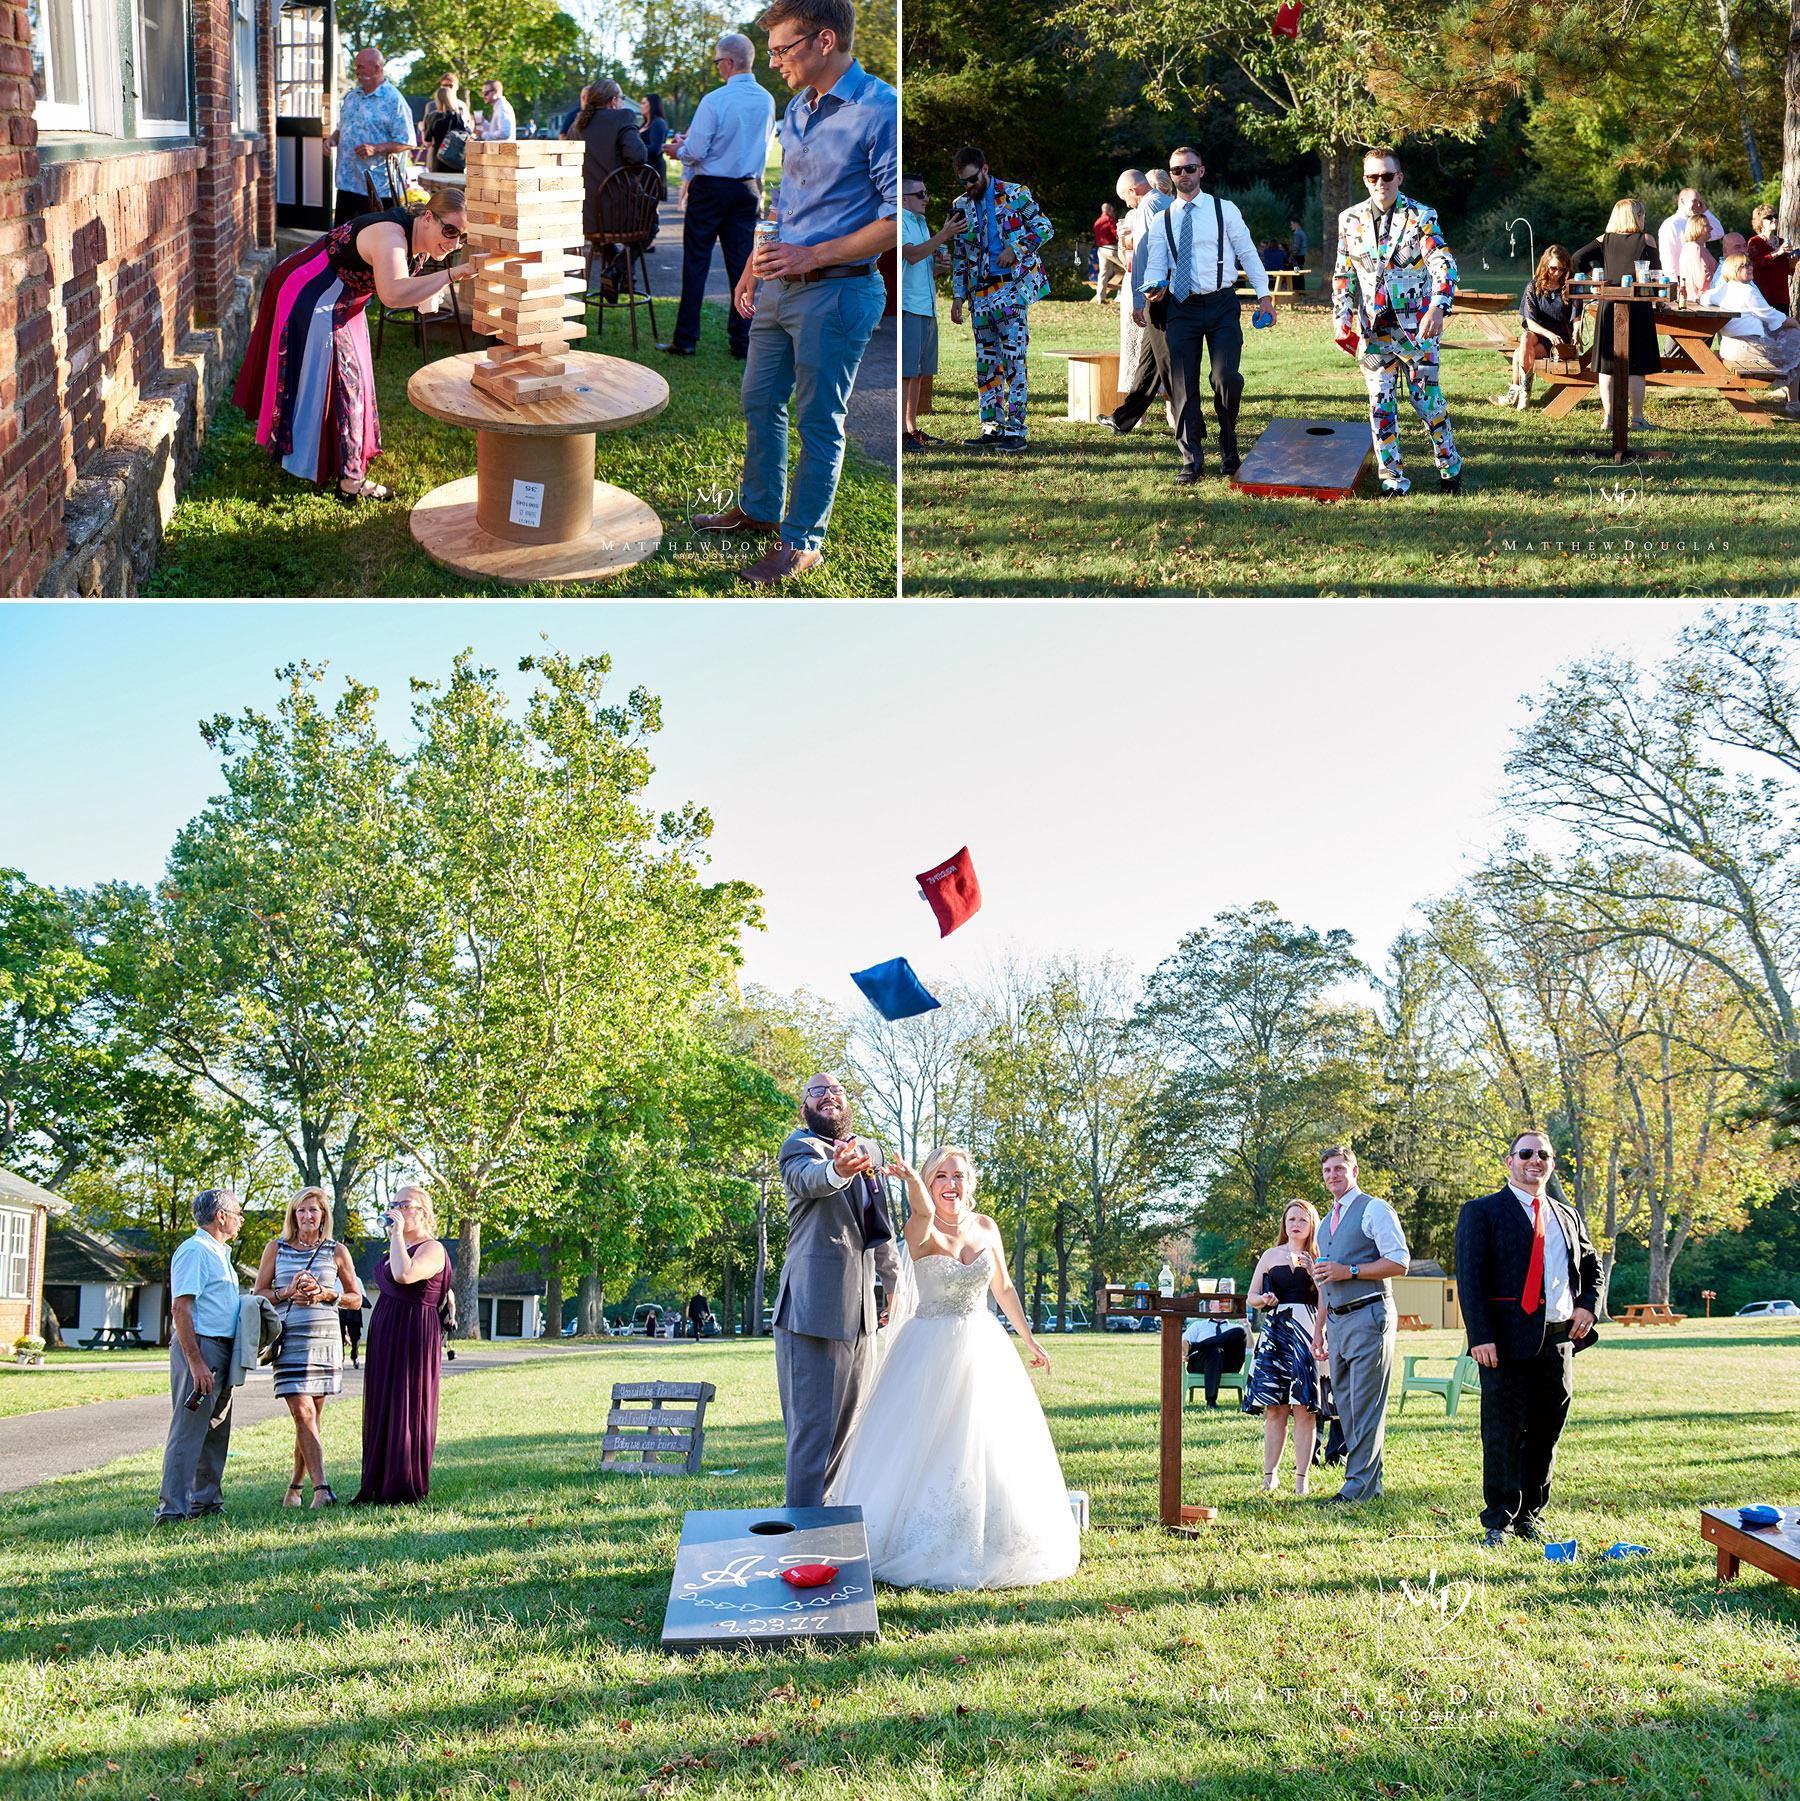 outdoor wedding games at brady life camp